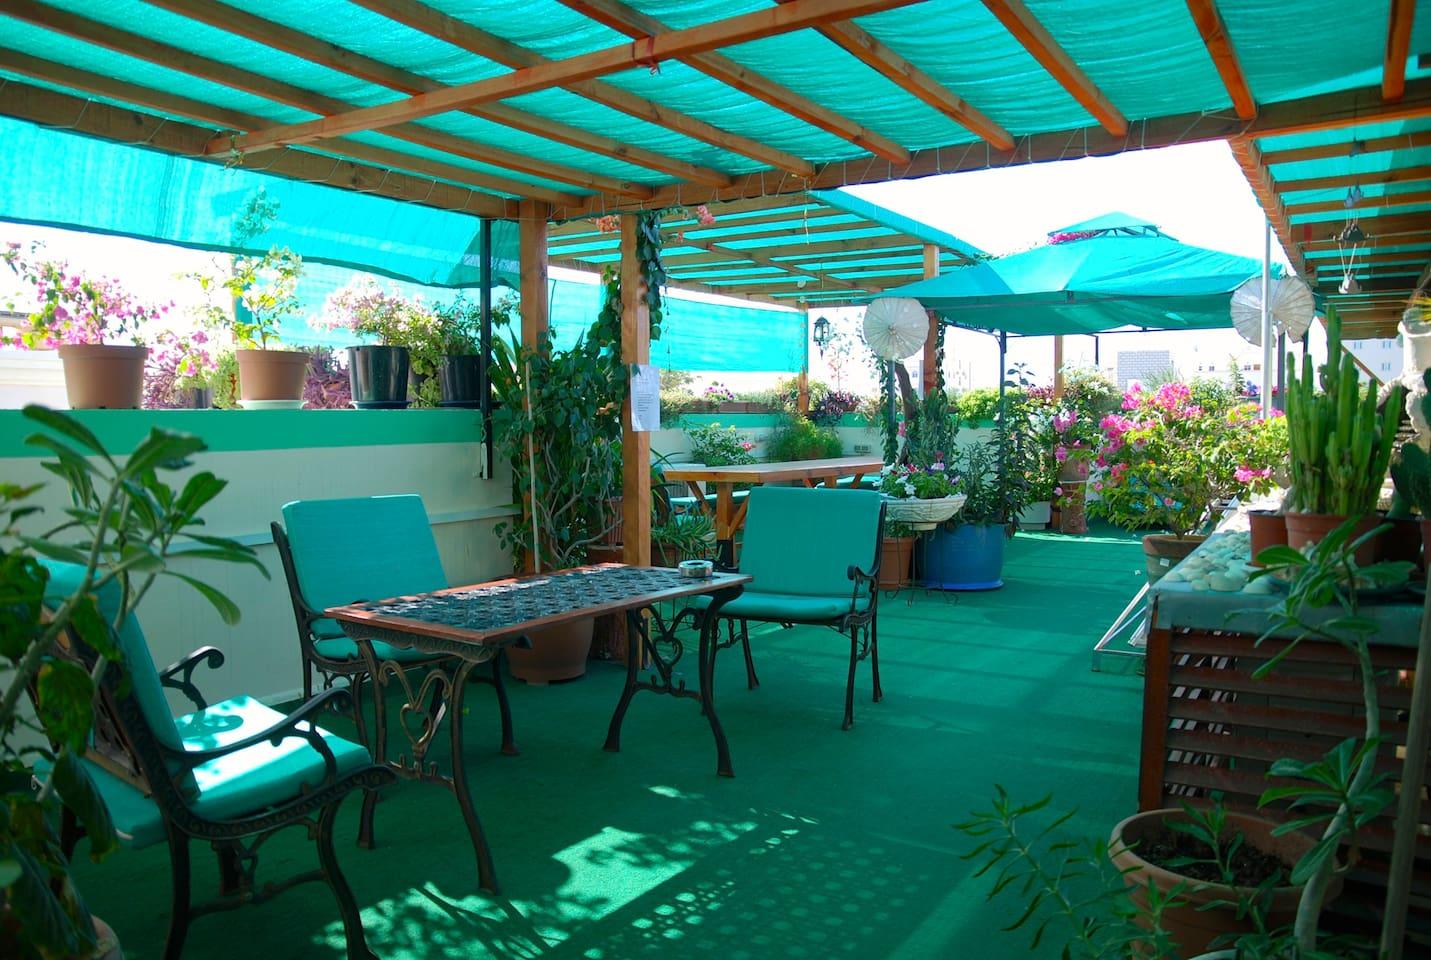 Roof Top Garden Parties and B-B-Q's